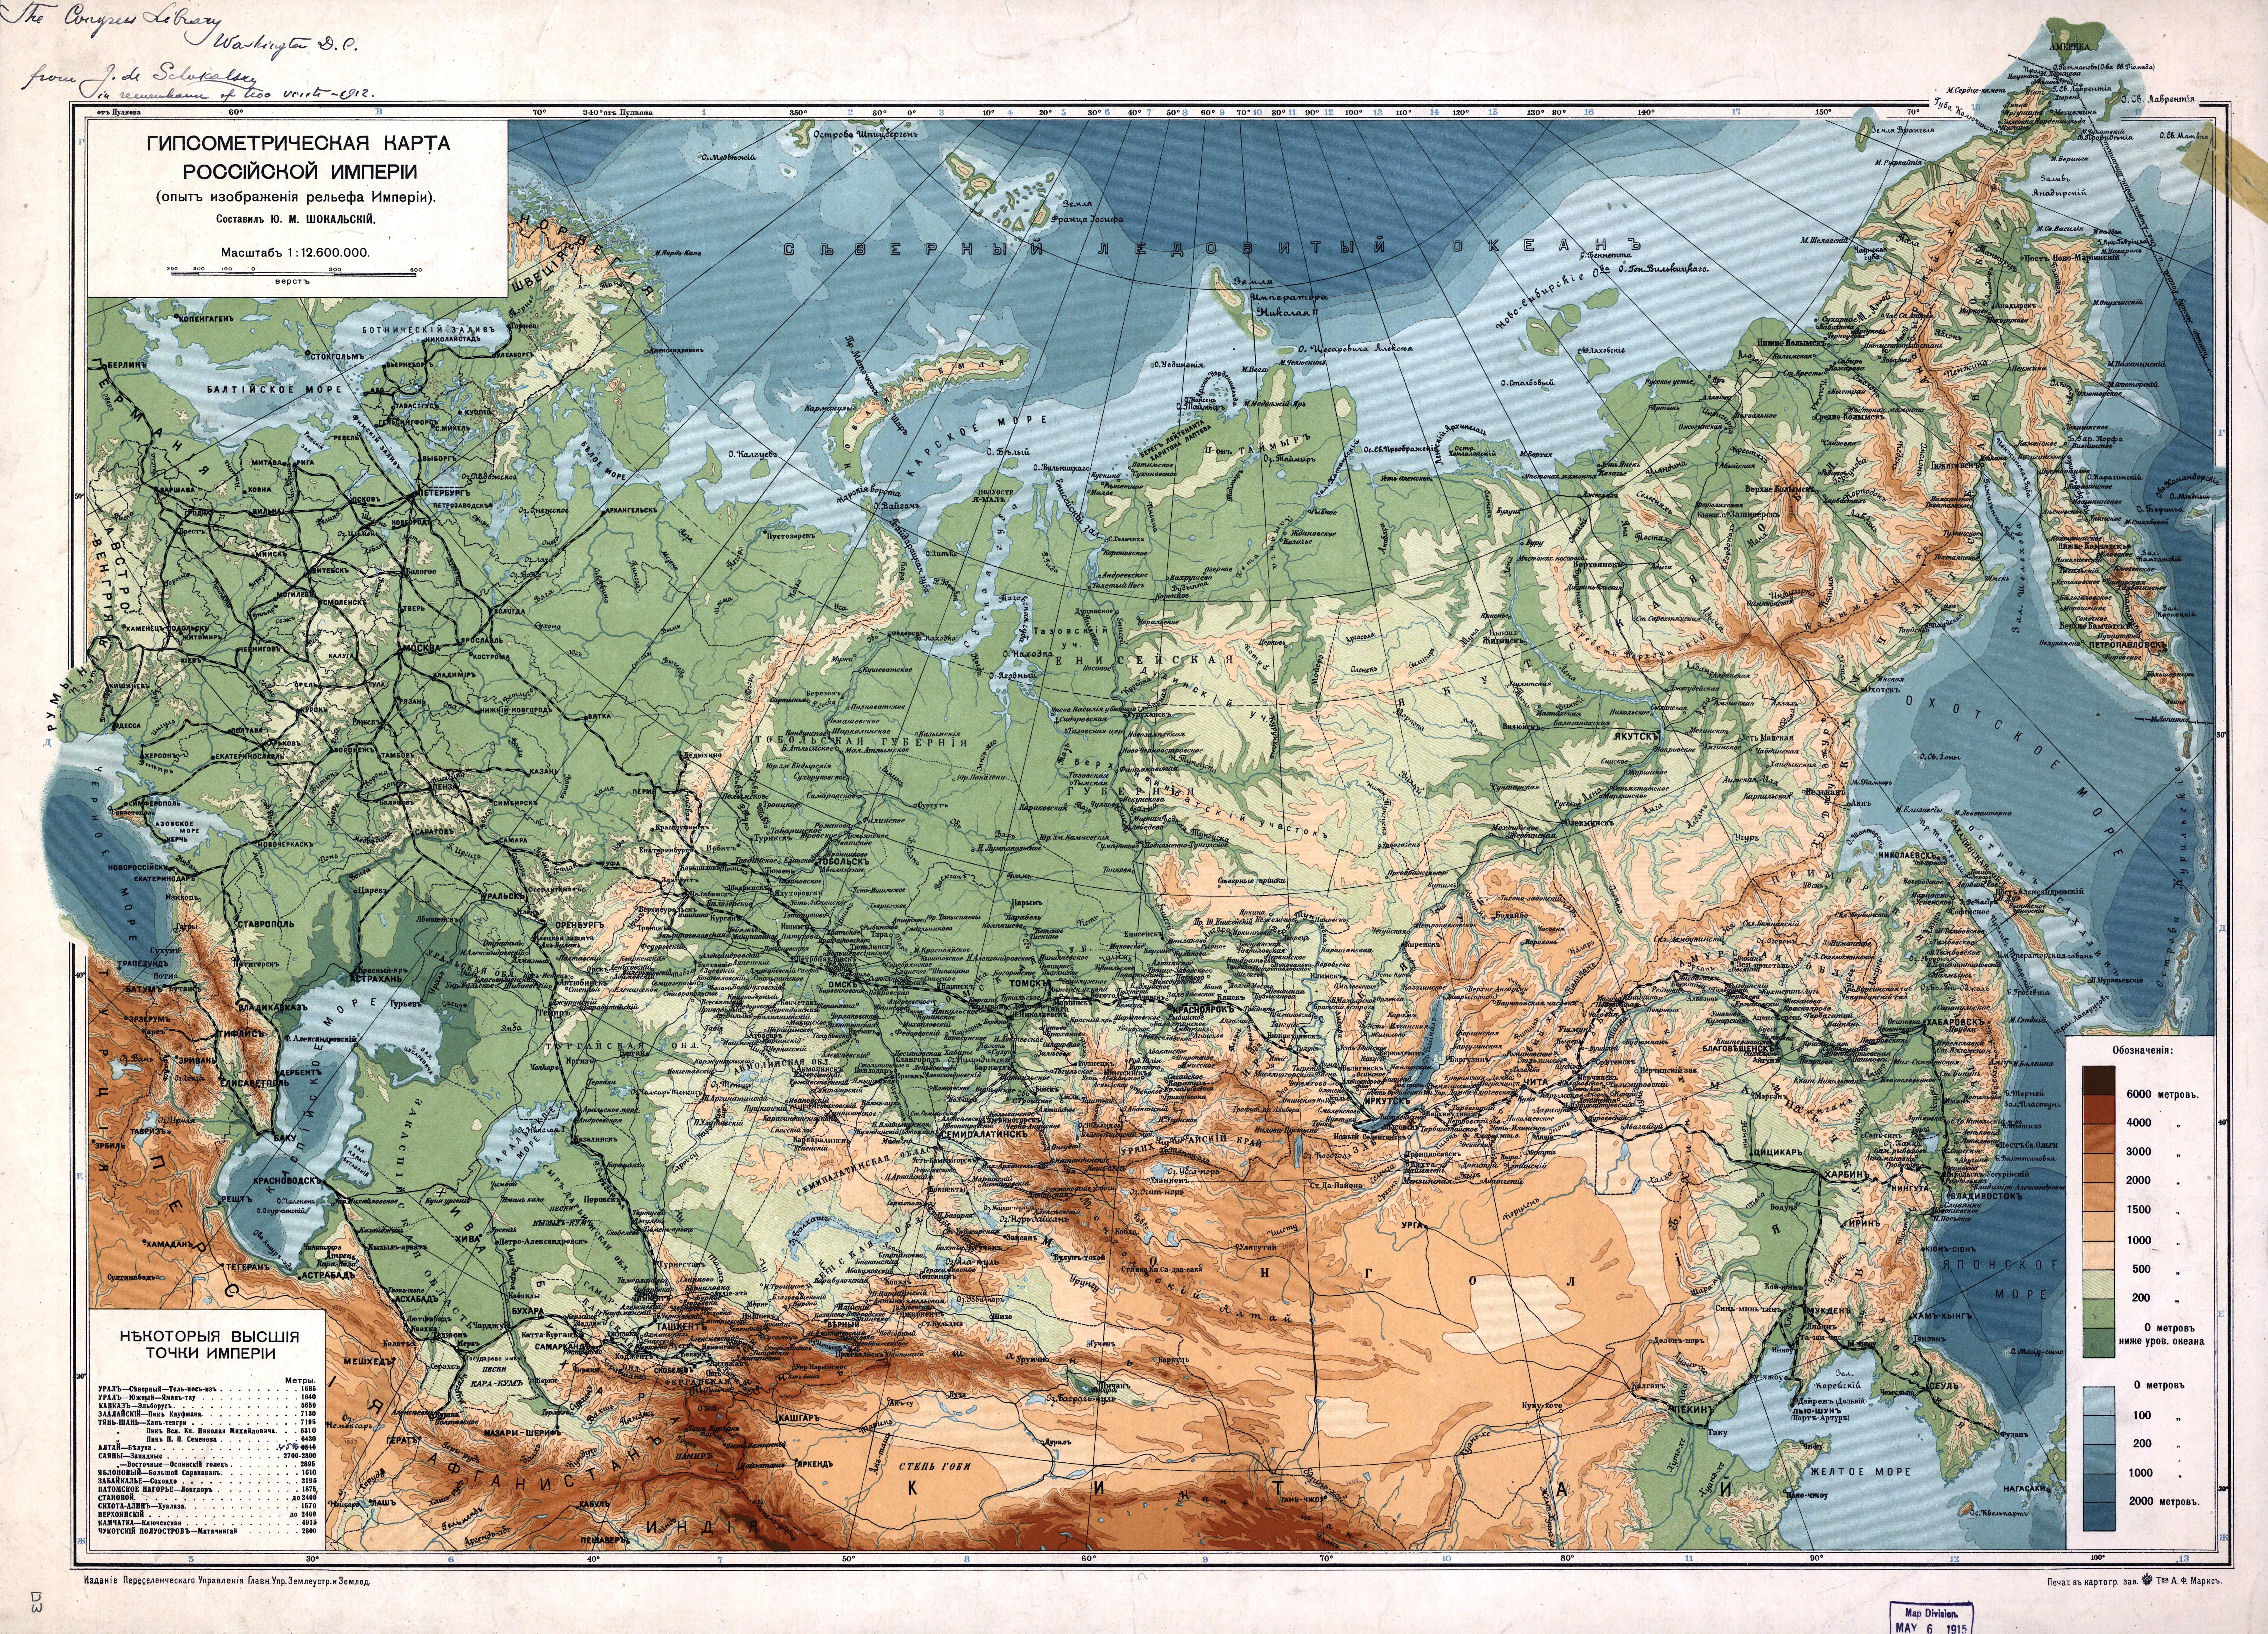 Map of the Russian Empire, circa 1912